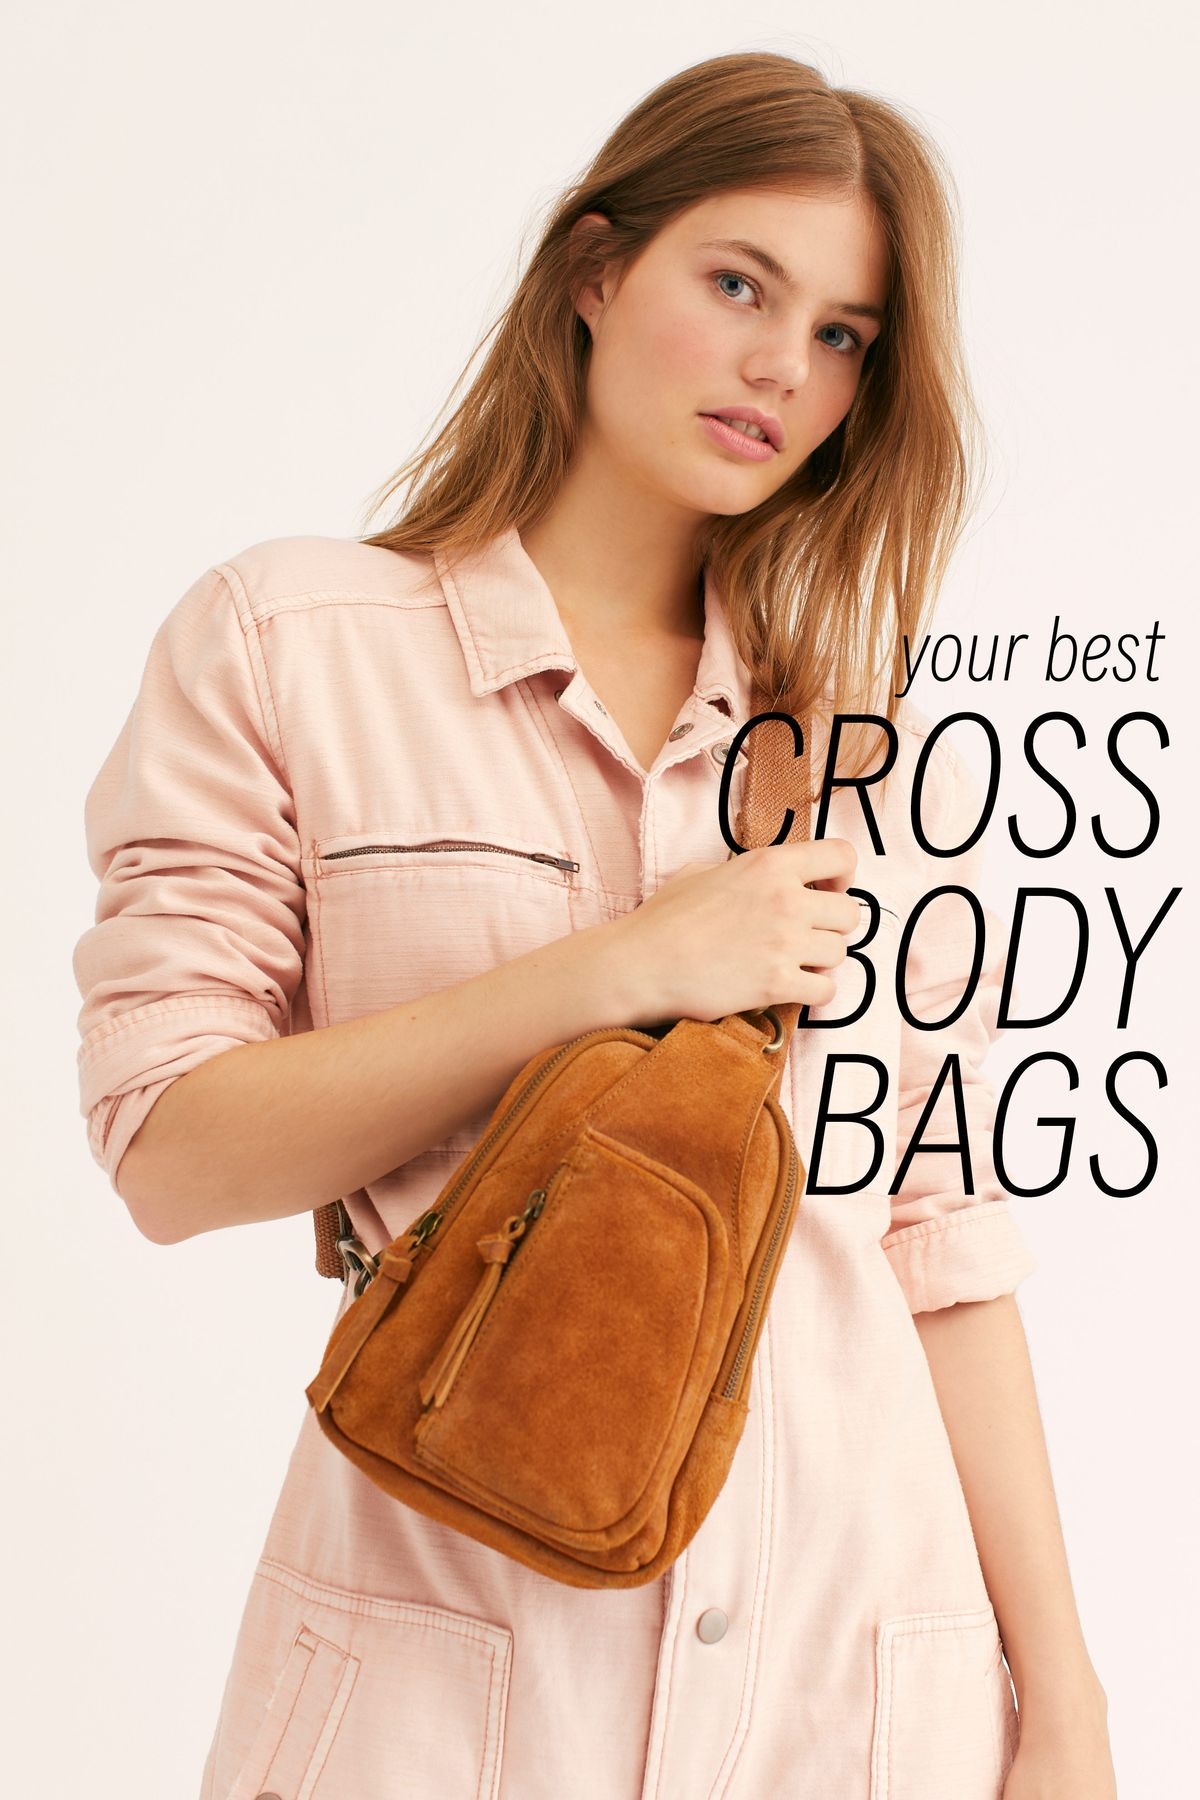 Your Best Crossbody Bags